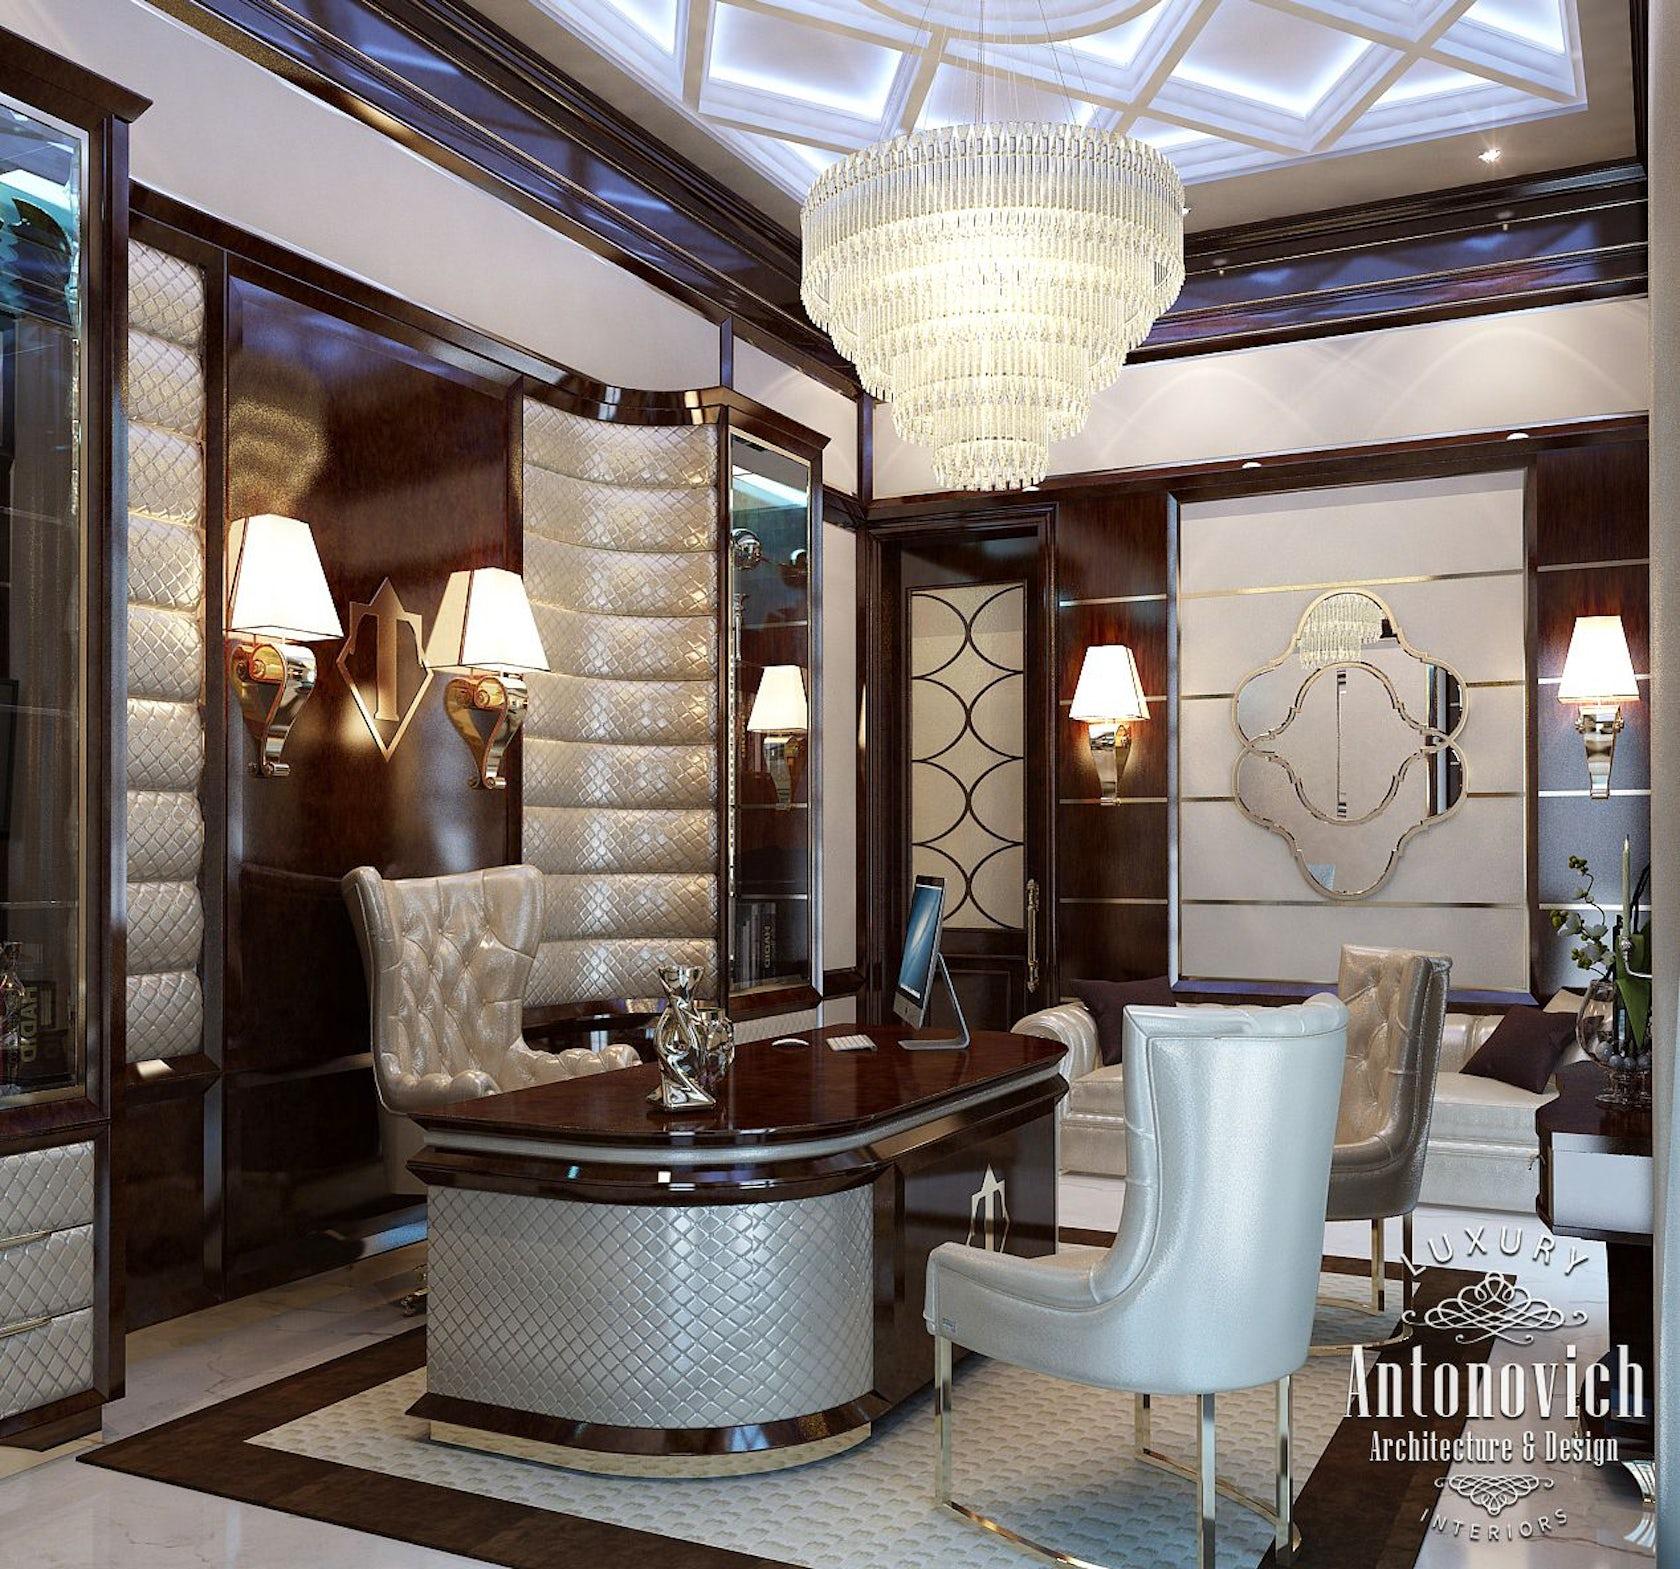 Katrina Antonovich Luxury Interior Design: Office Interior From Luxury Antonovich Design